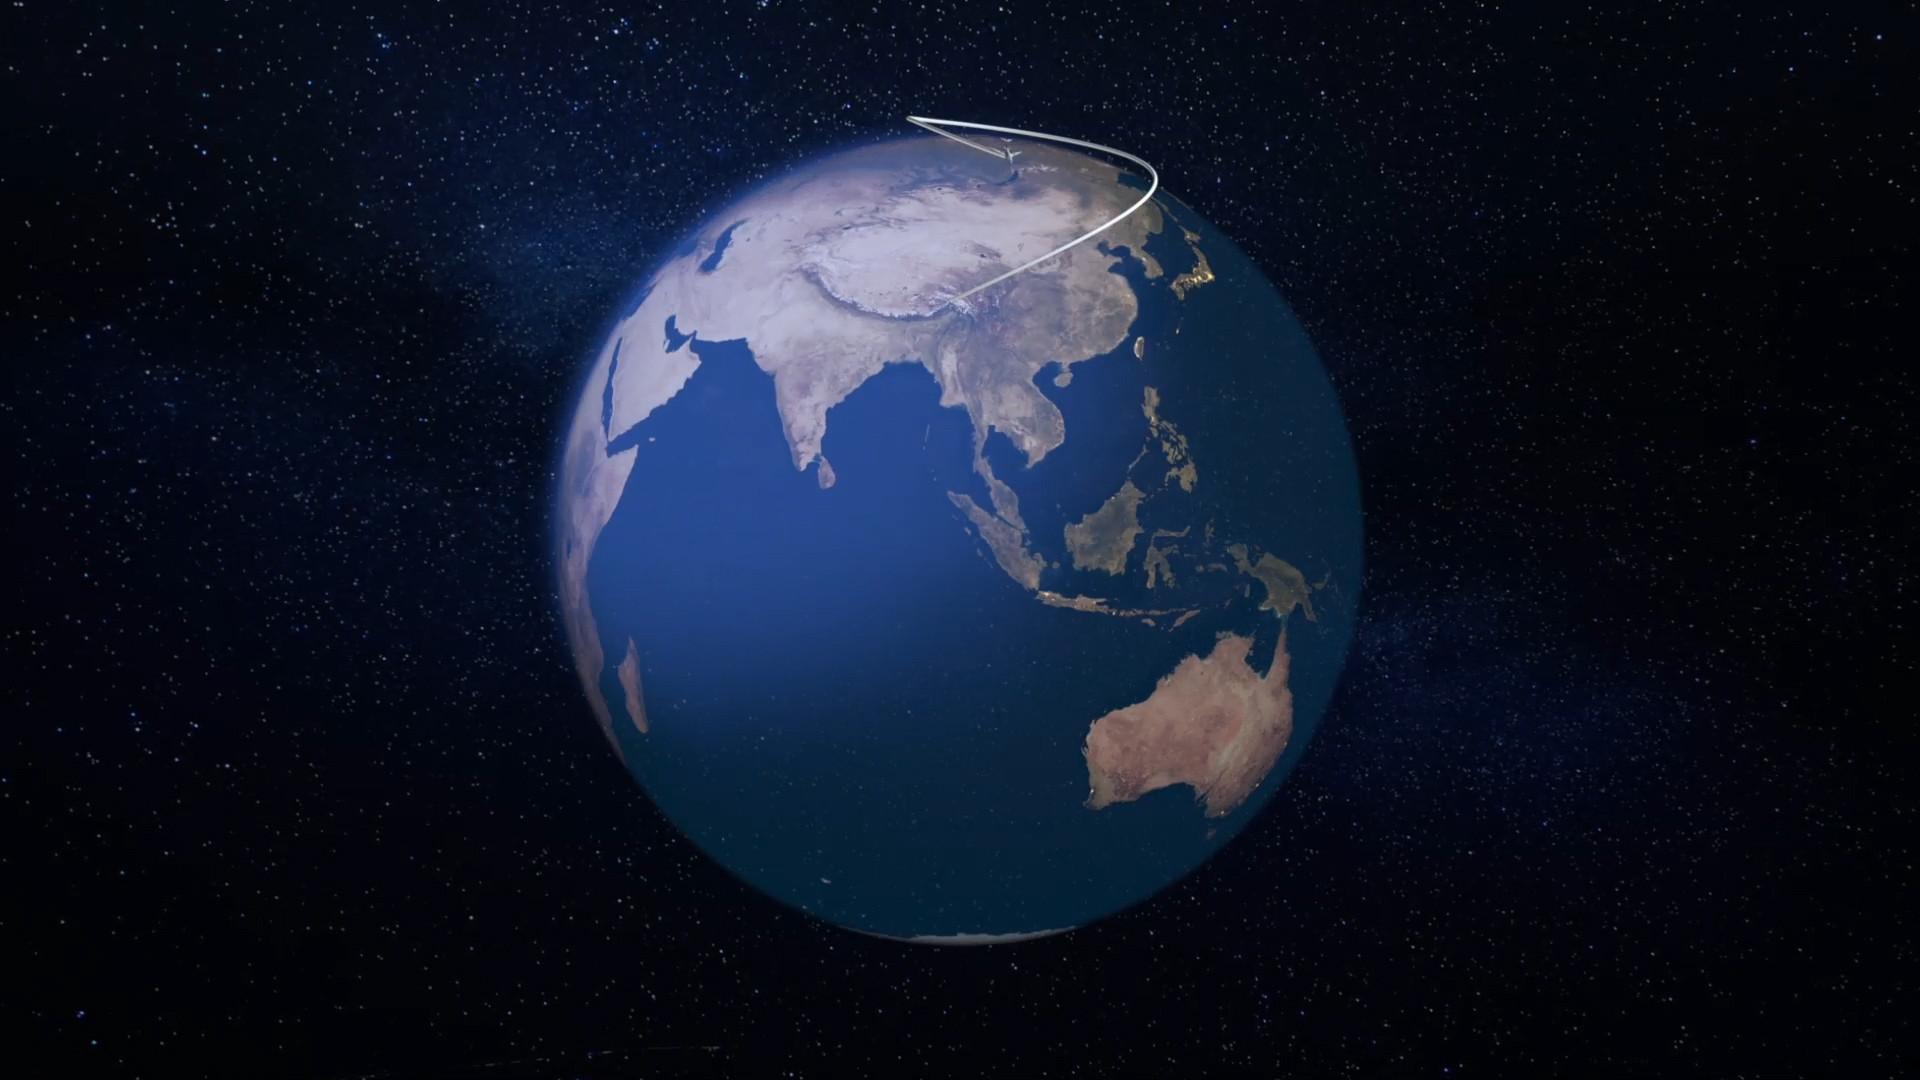 02. One More Orbit Flight Path